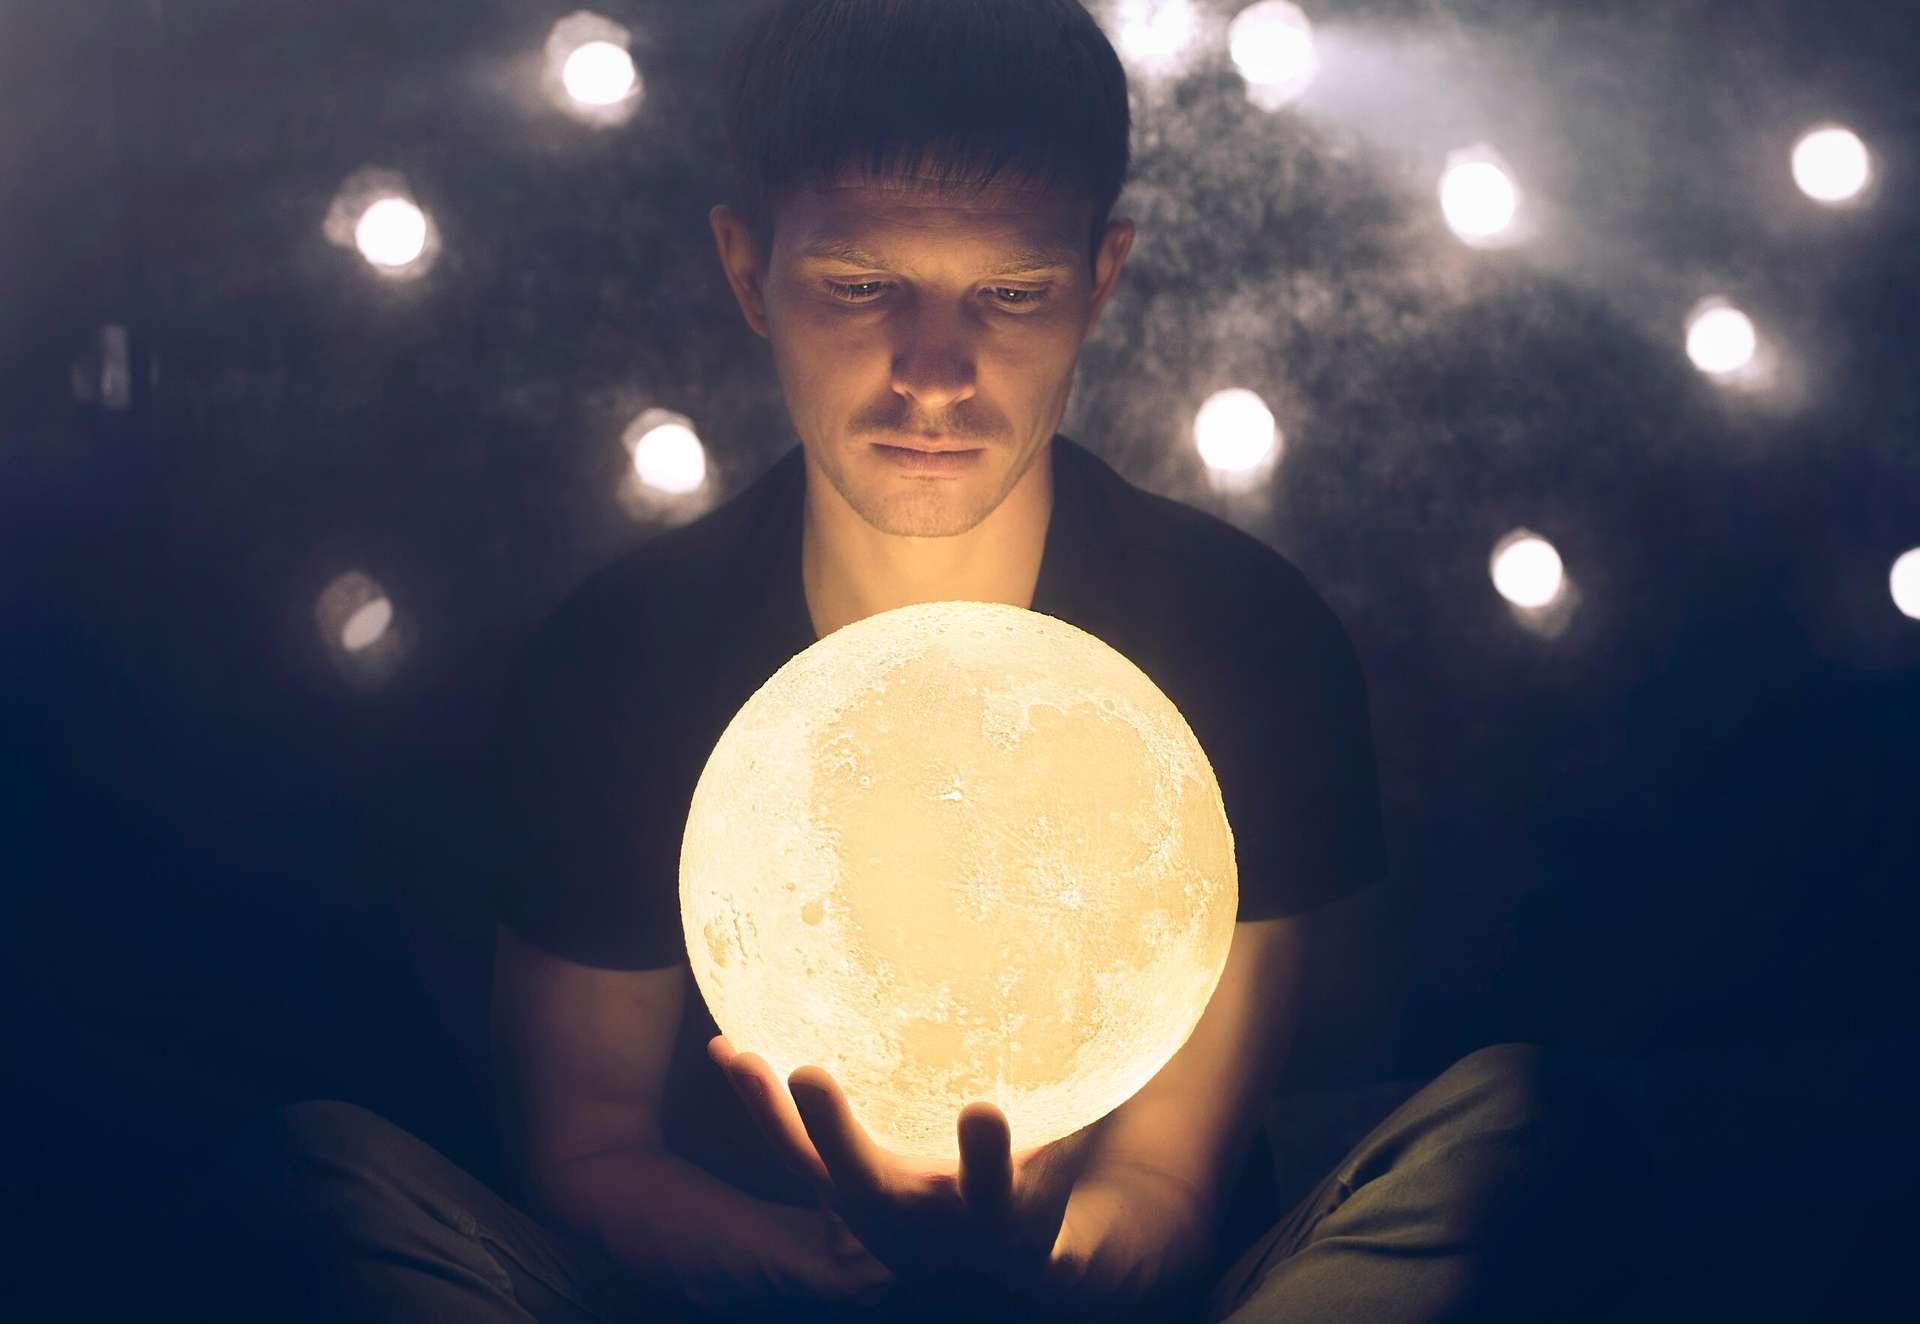 Jungfrau Horoskop für die 21. Woche (24.5. - 30.5.)